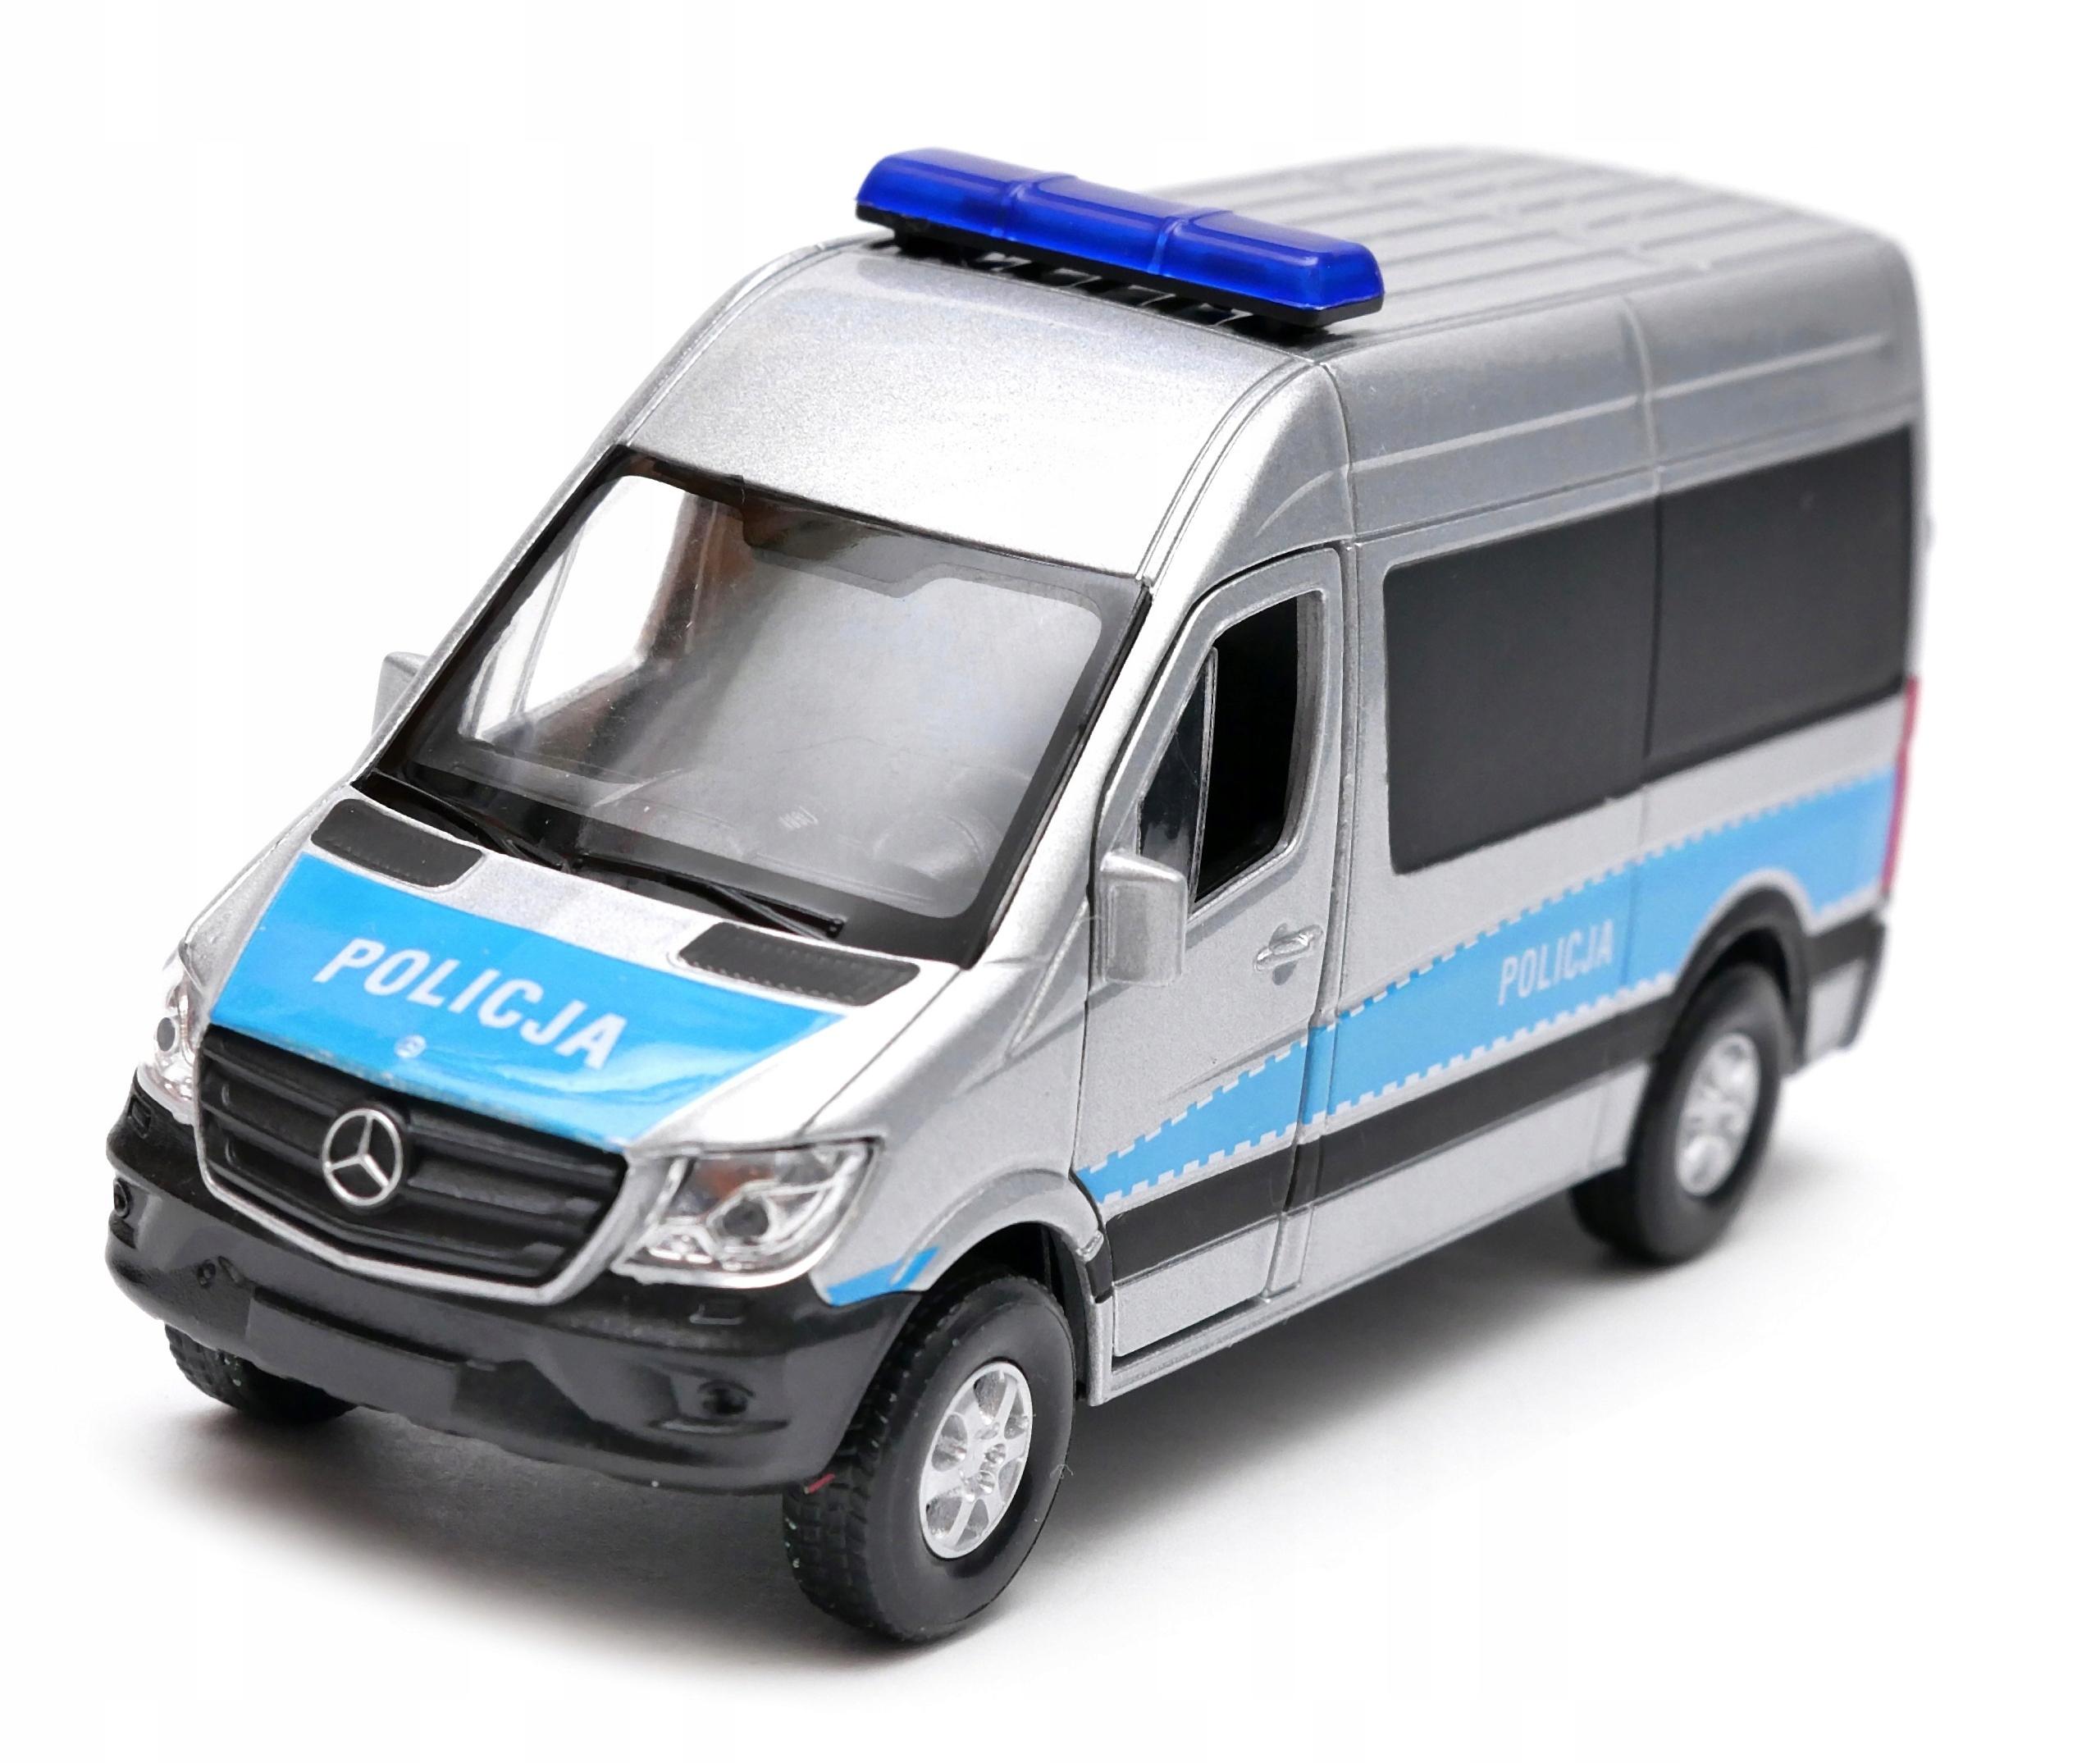 Mercedes-Benz Sprinter Van Polícia 1:34 - 39 Welly